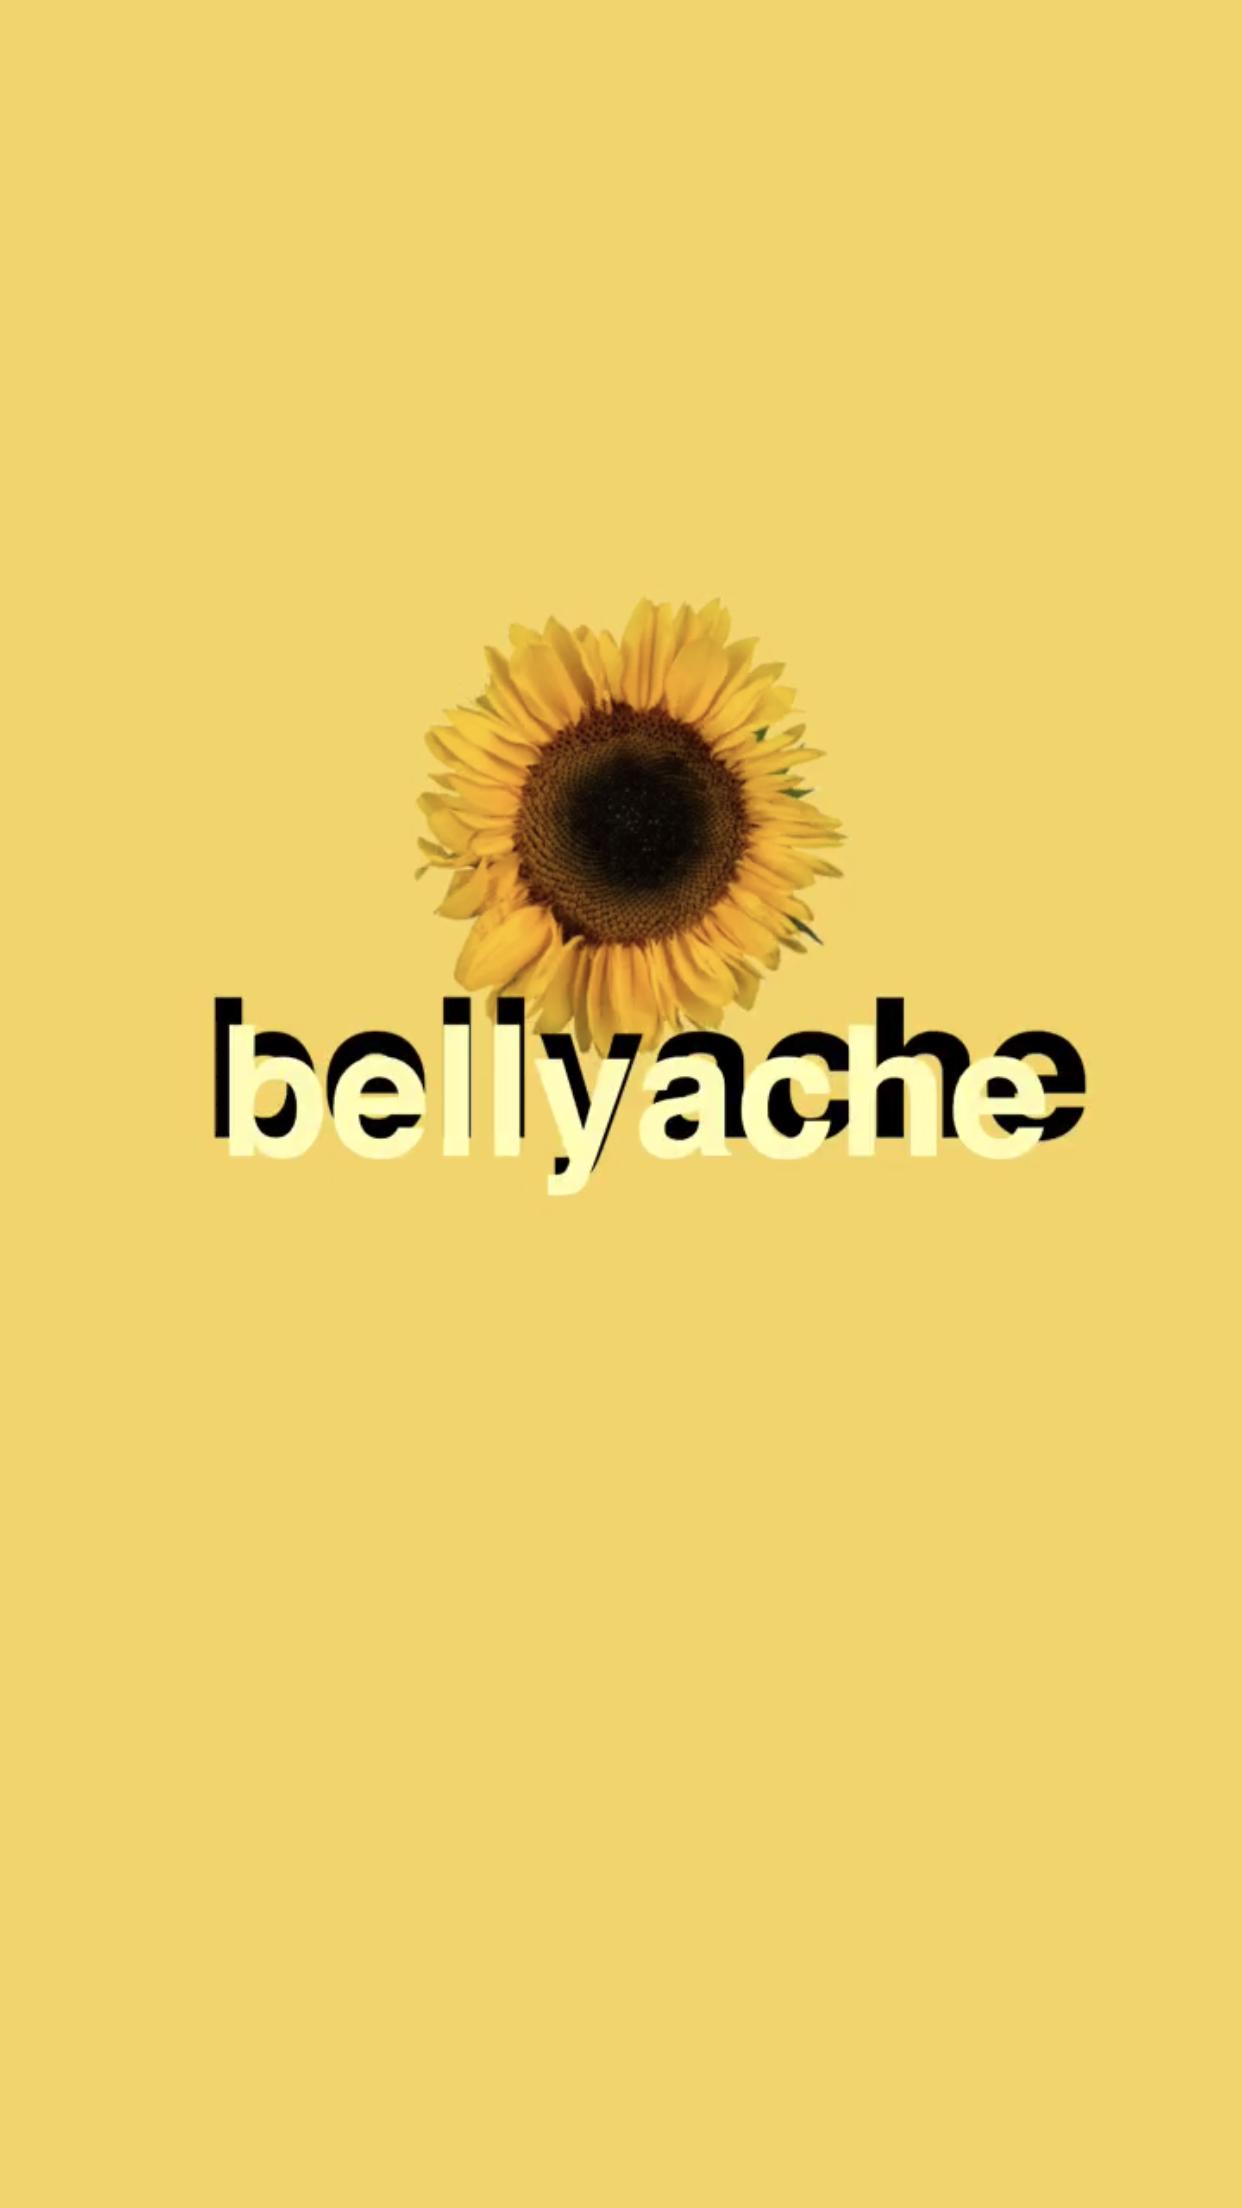 Bellyache Yellow Wallpaper Aesthetic Wallpapers Yellow Wallpaper Billie Eilish